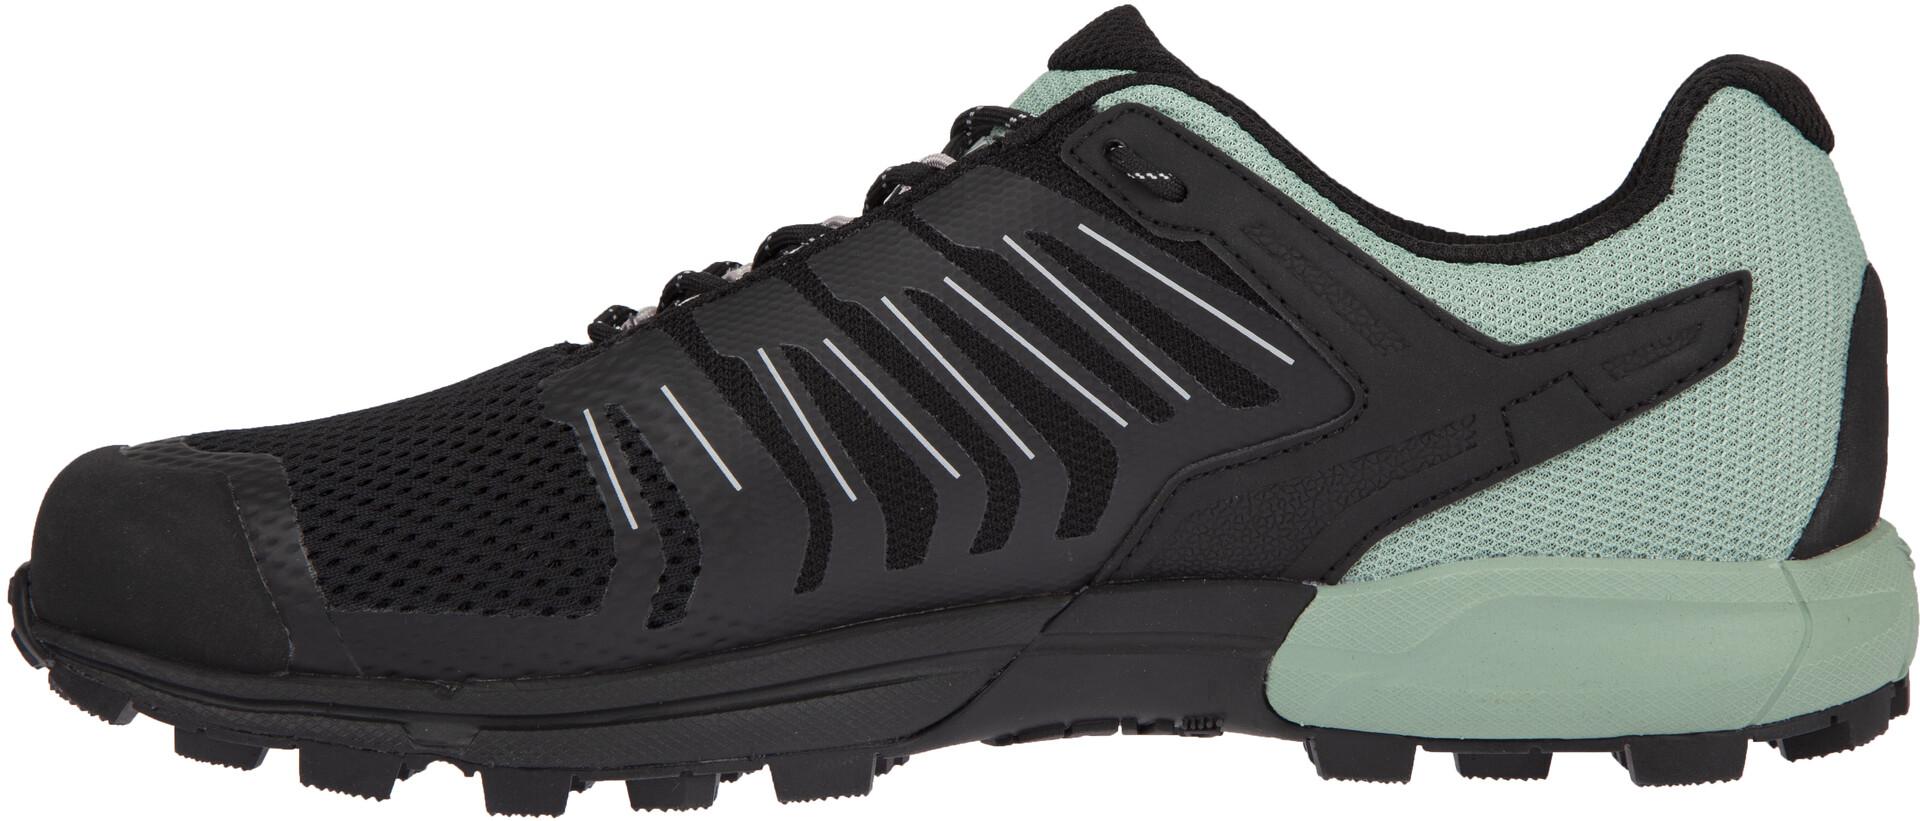 inov 8 Roclite 315 GTX Shoes Dame blackgreen